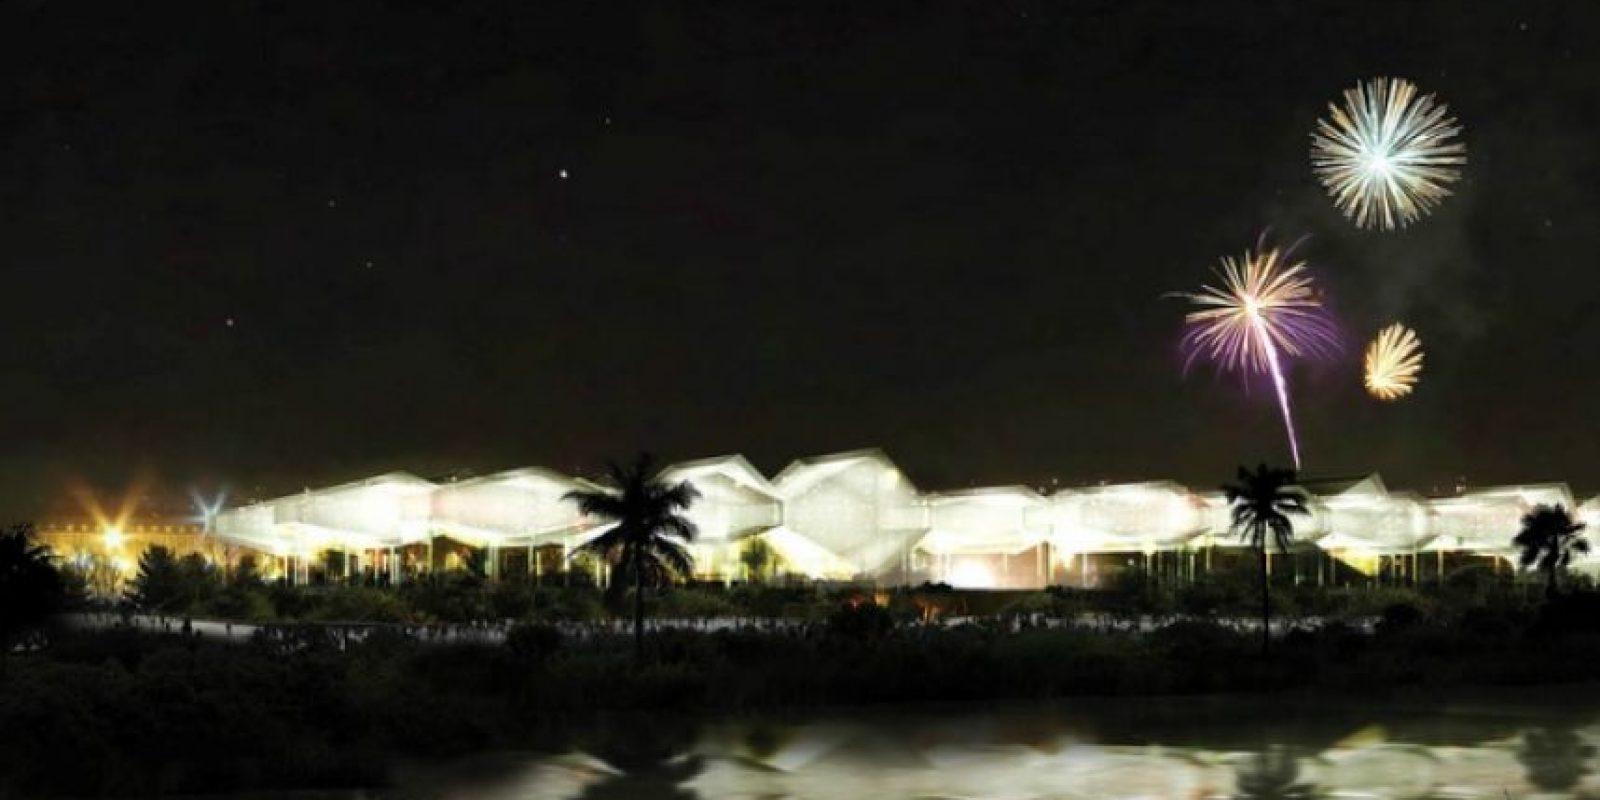 Centro de Eventos del Caribe de Giarcarlo Mazzanti. Foto:Alcaldía de Barranquilla